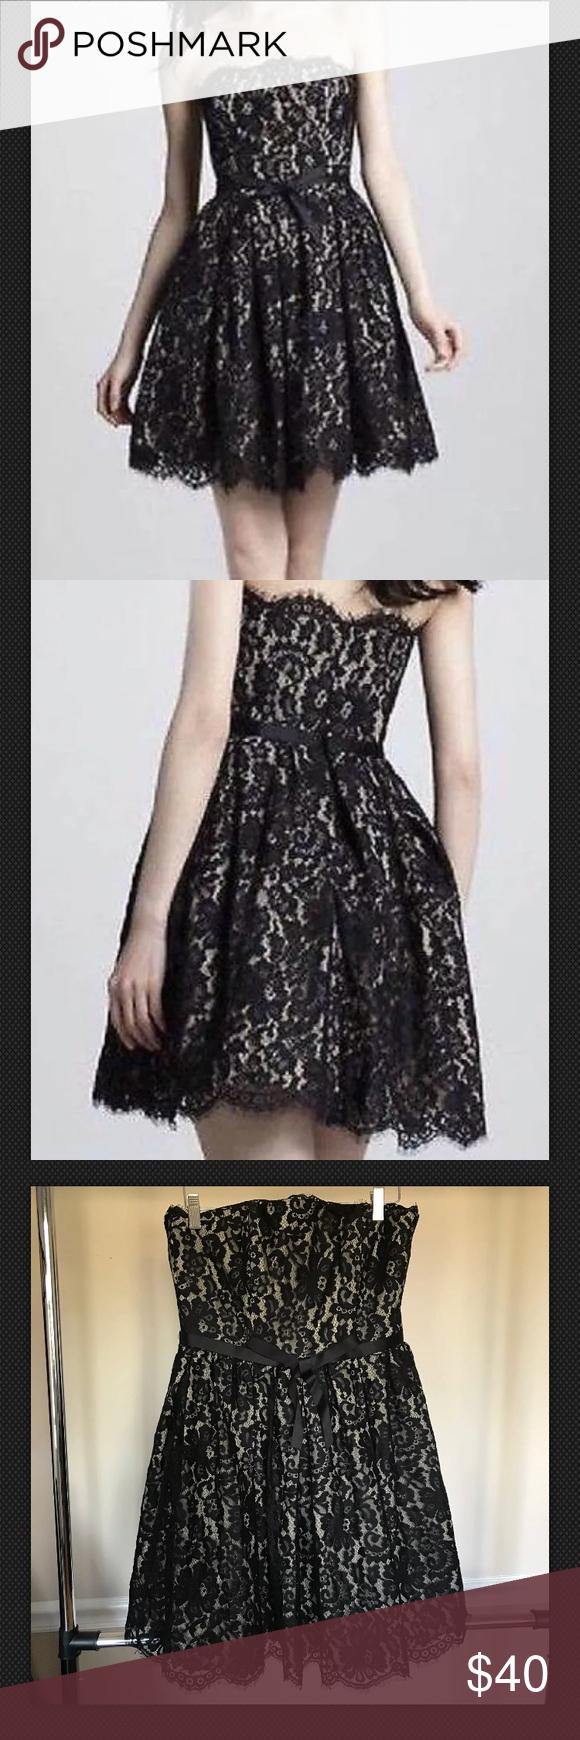 Last One Robert Rodriguez For Target Black Dress Black Lace Party Dress Lace Party Dresses Dresses [ 1740 x 580 Pixel ]